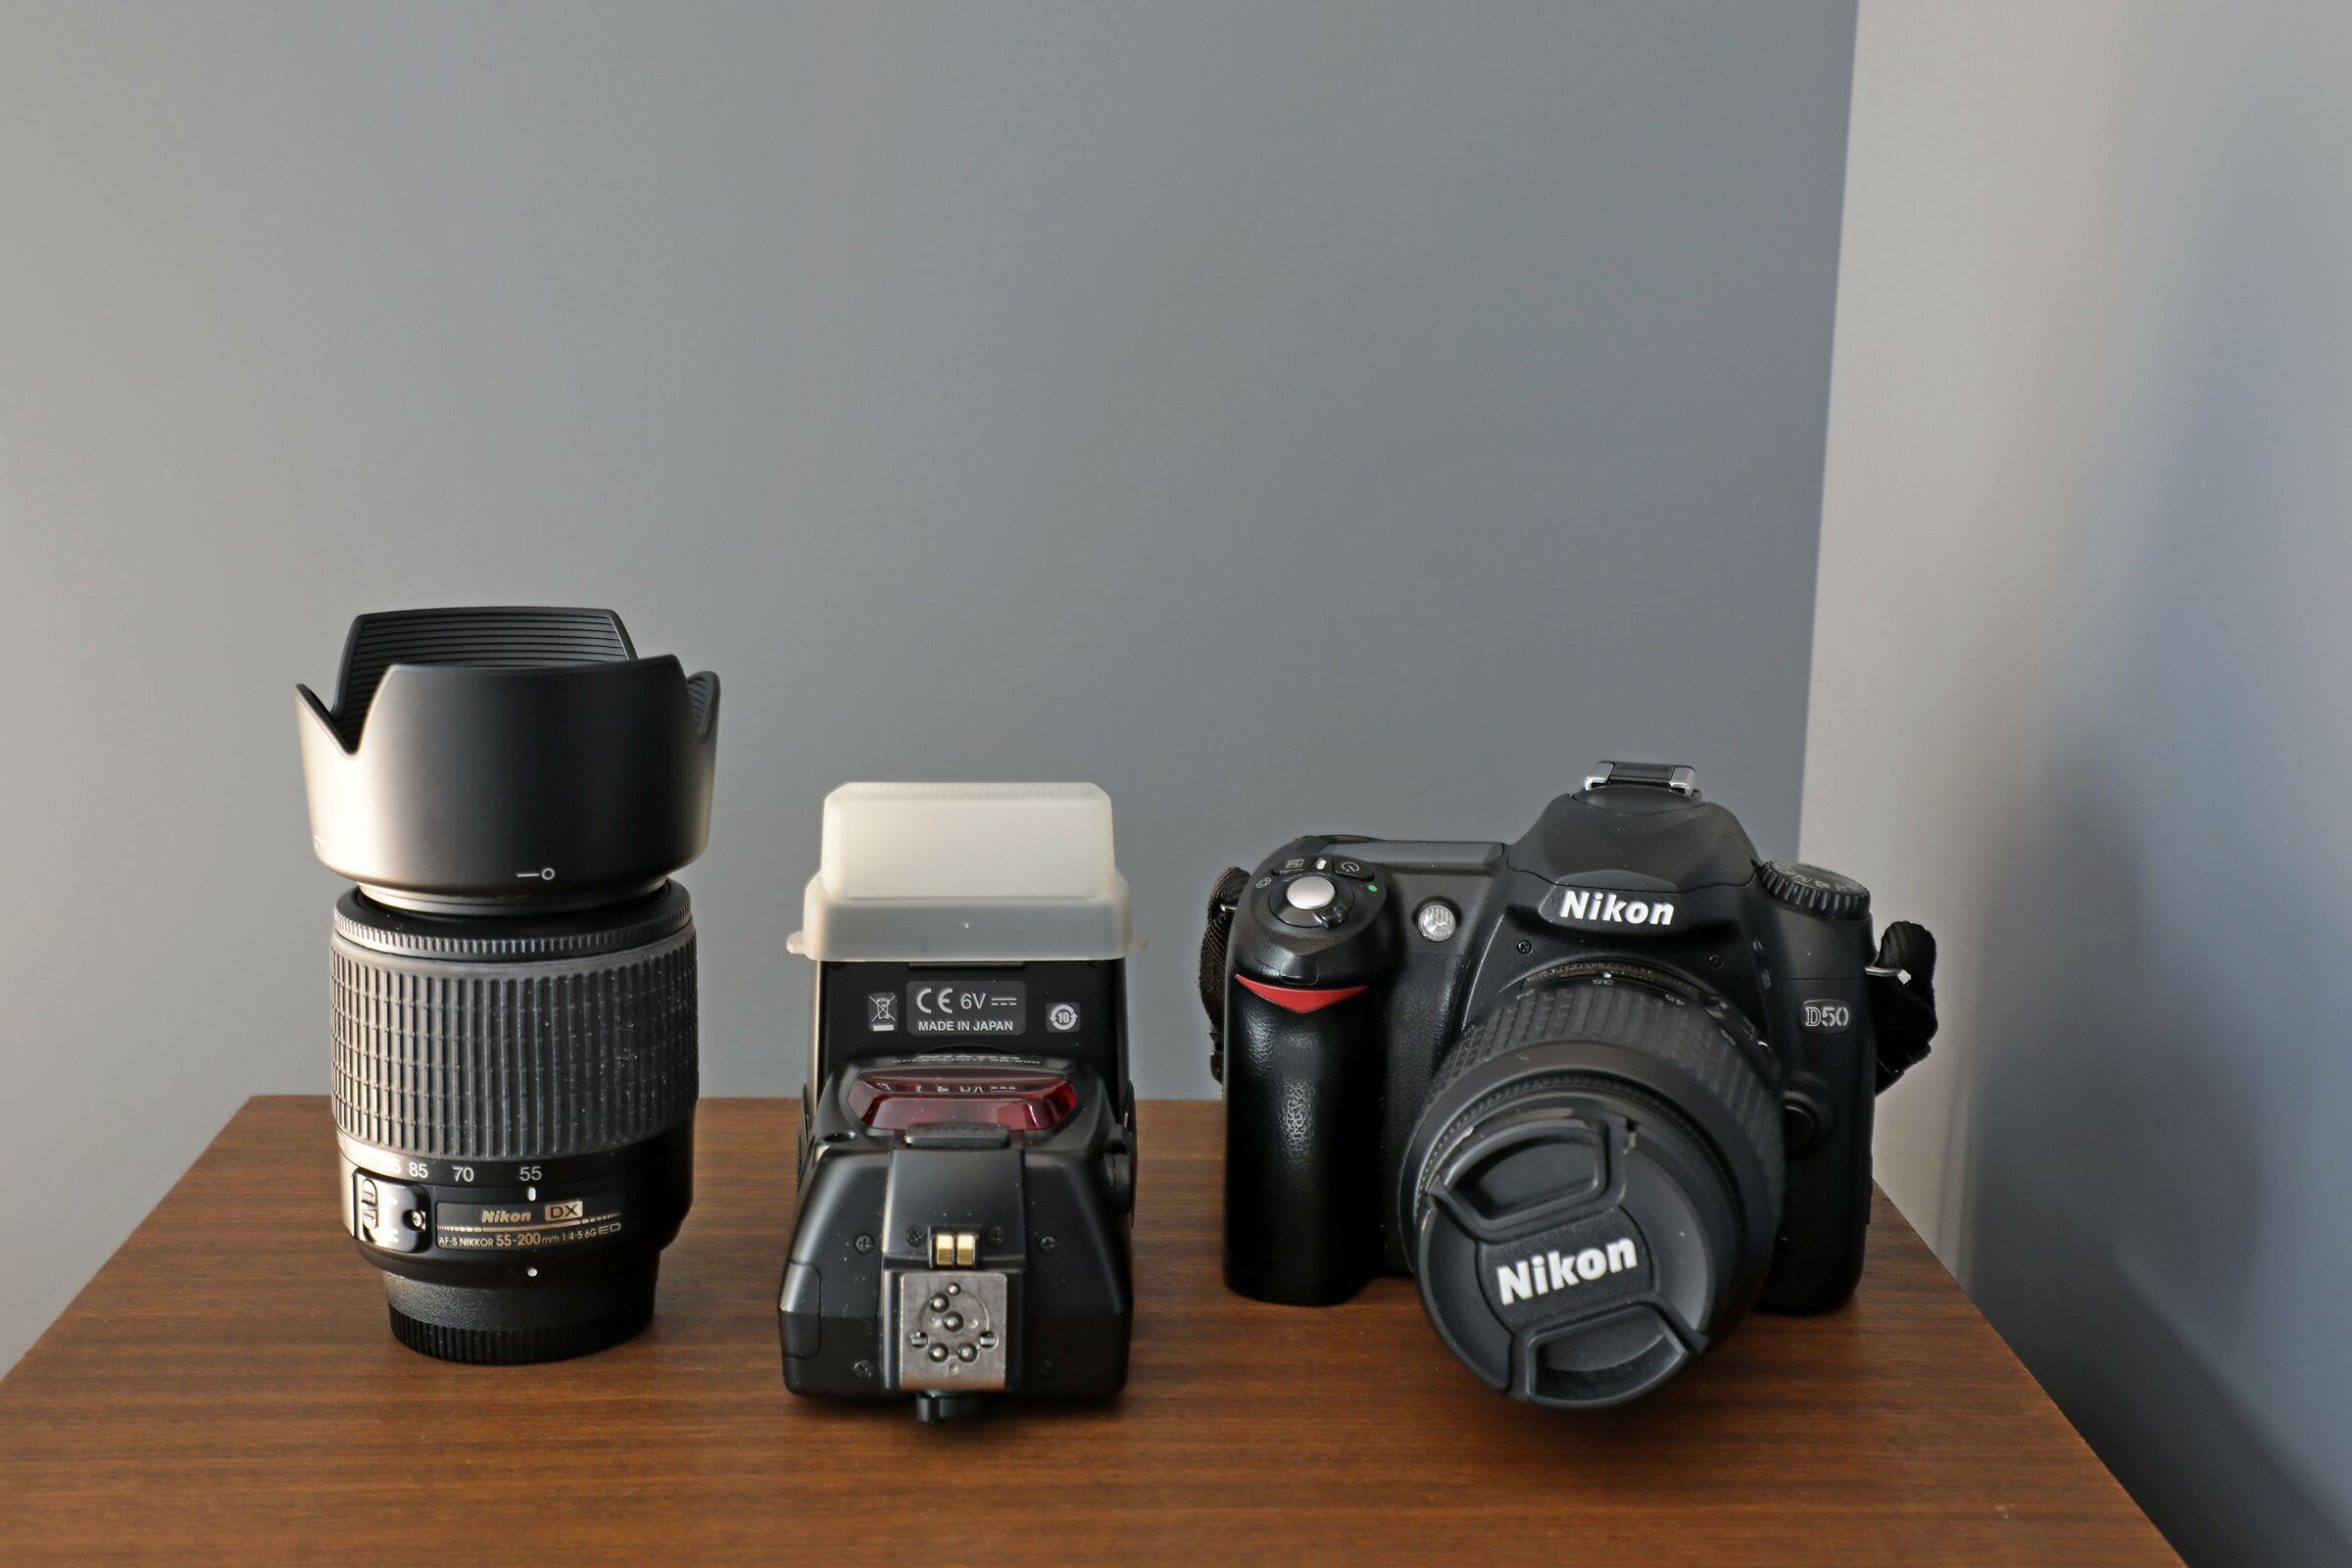 Nikon D 50 con 18-55/55-200/flash Sb-800--...